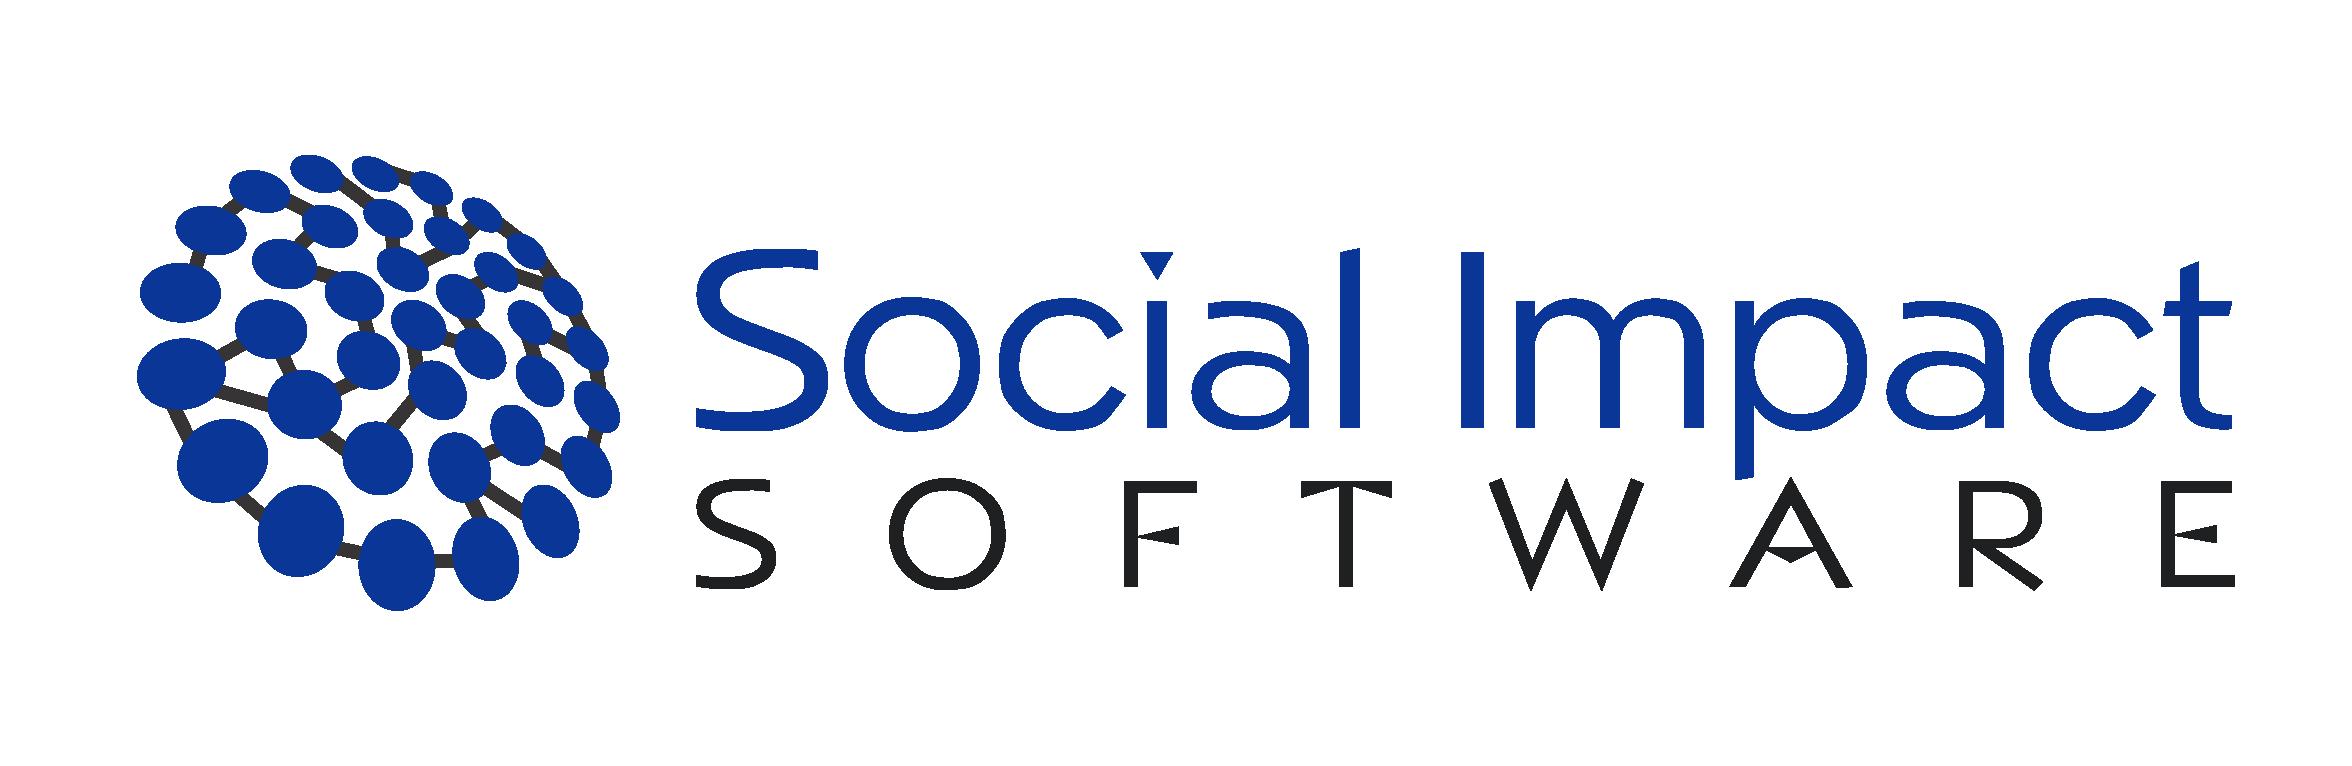 Social Impact Software